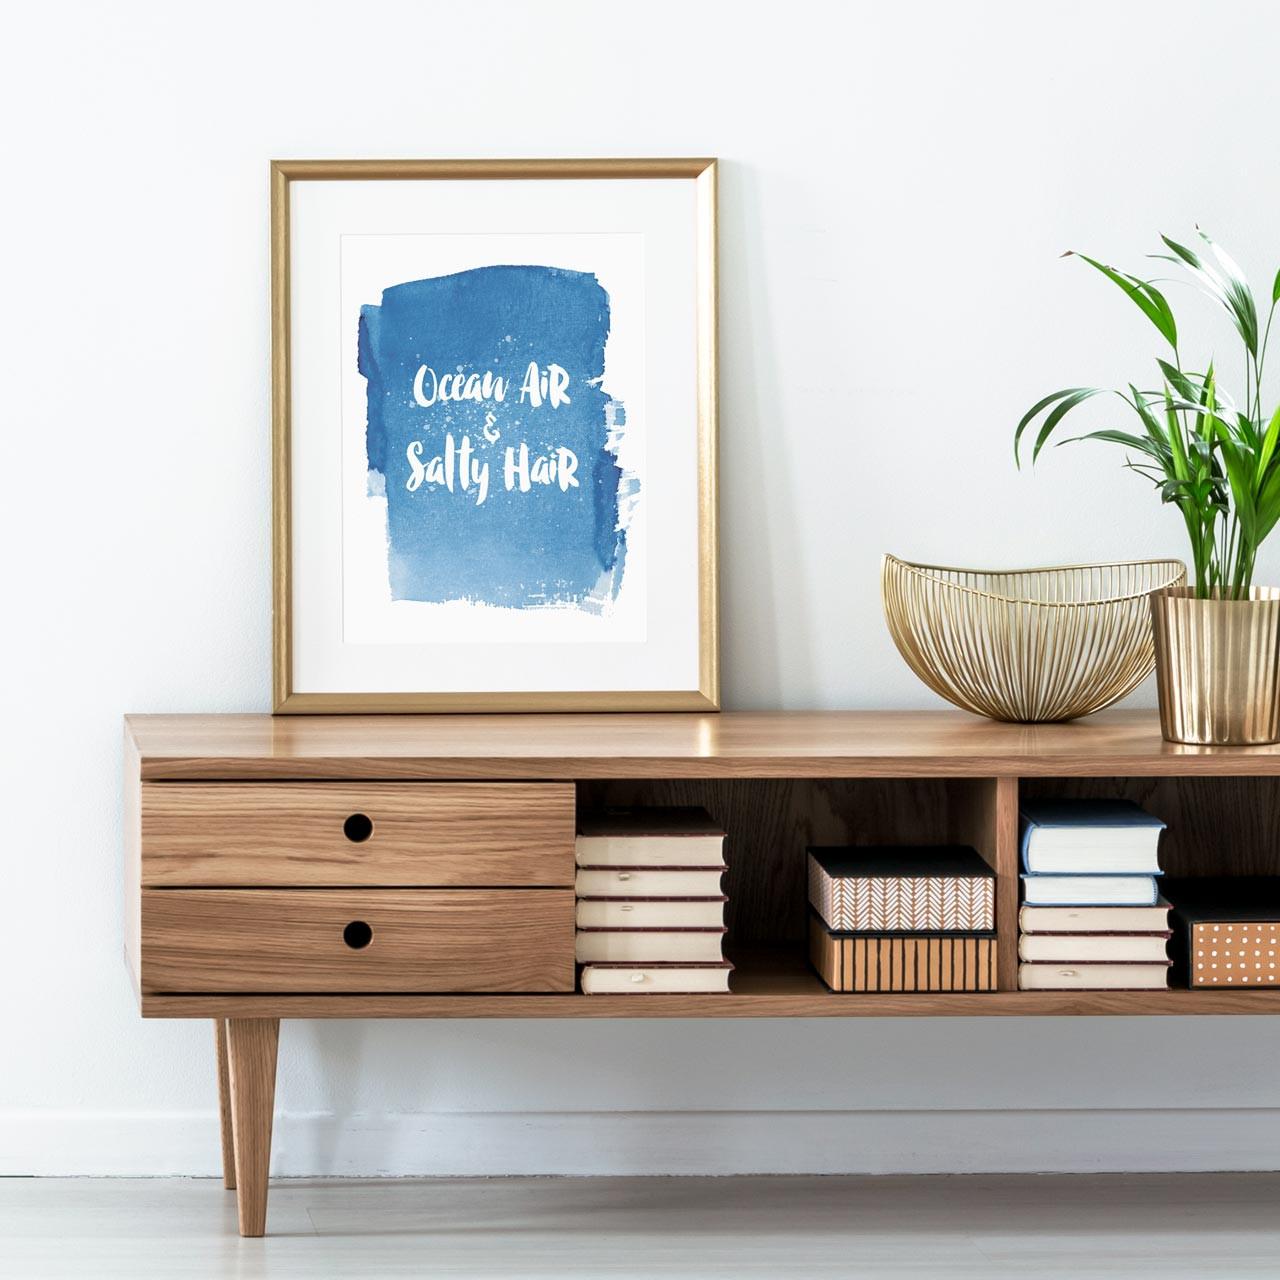 'Ocean Air & Salty Hair' Art Print from The Printed Home